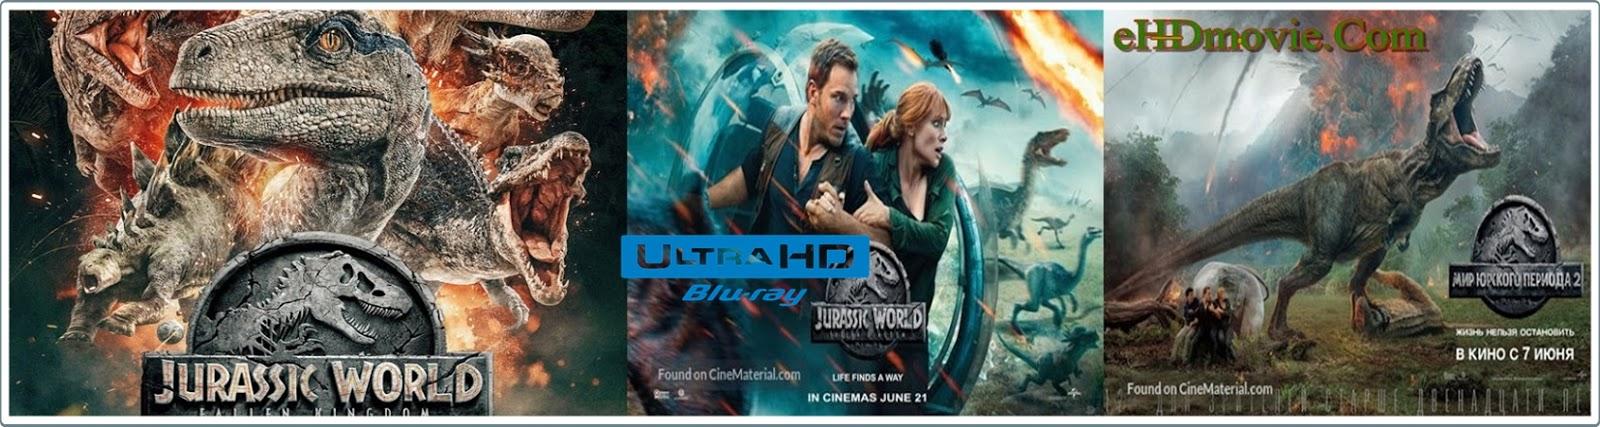 Jurassic World Fallen Kingdom 2018 Full Movie Dual Audio [Hindi – English] 1080p - 720p - HEVC - 480p ORG BRRip 400MB - 600MB - 1.1GB - 3GB ESubs Free Download